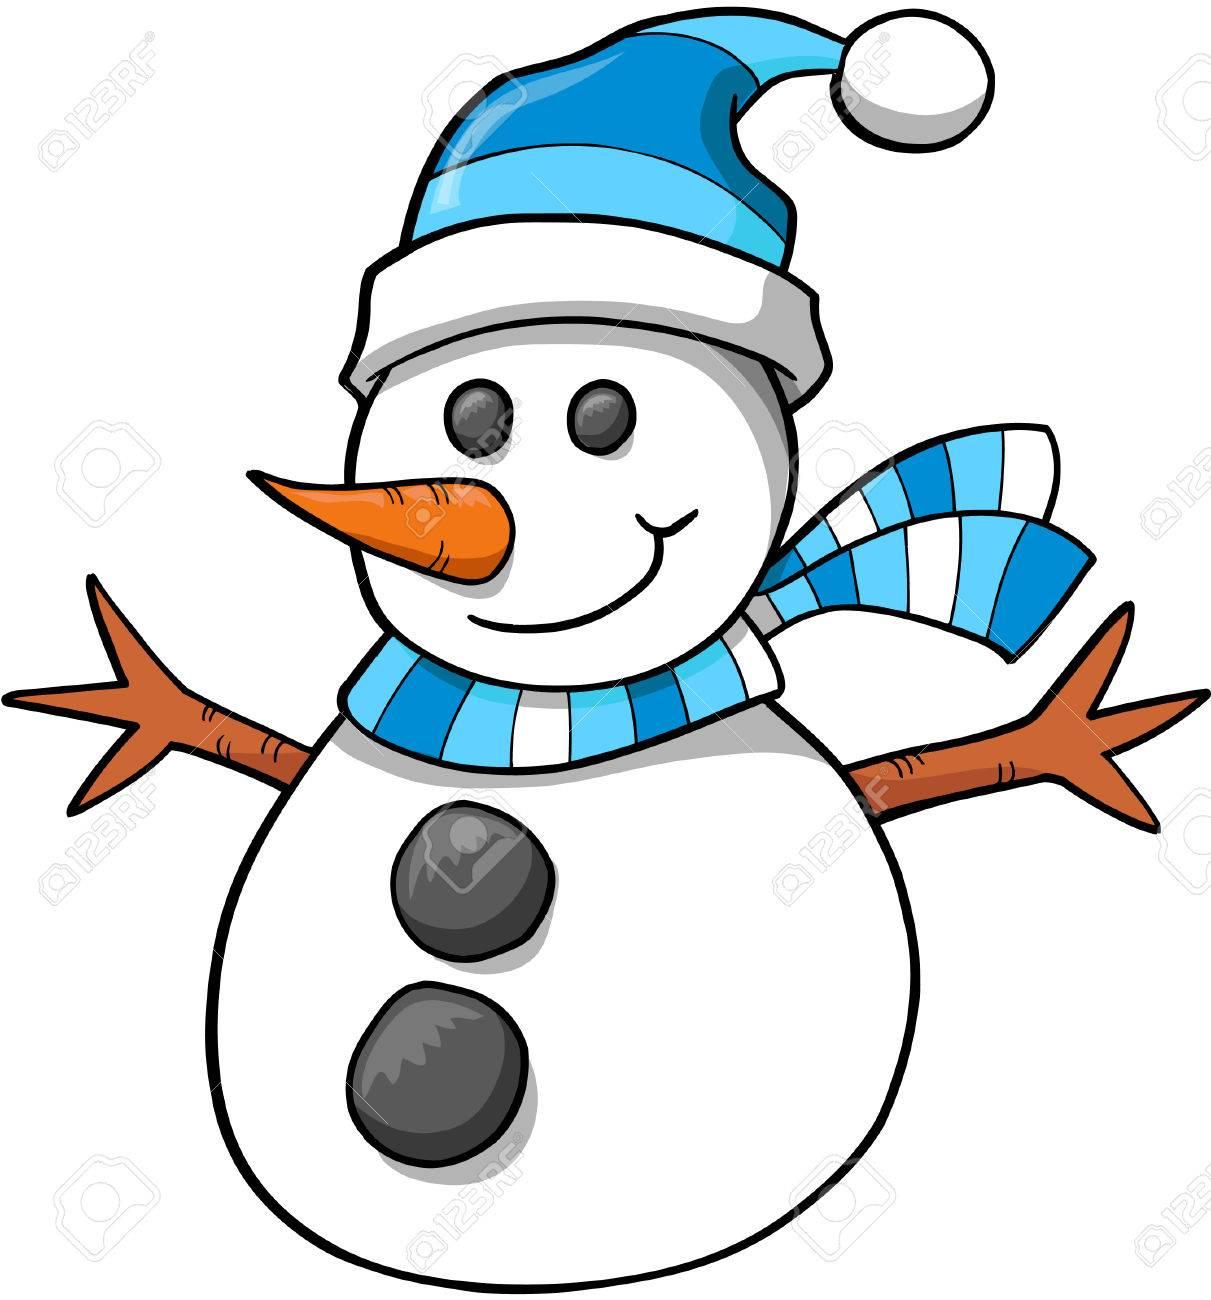 Christmas Holidays Clipart.Christmas Holiday Snowman Vector Illustration